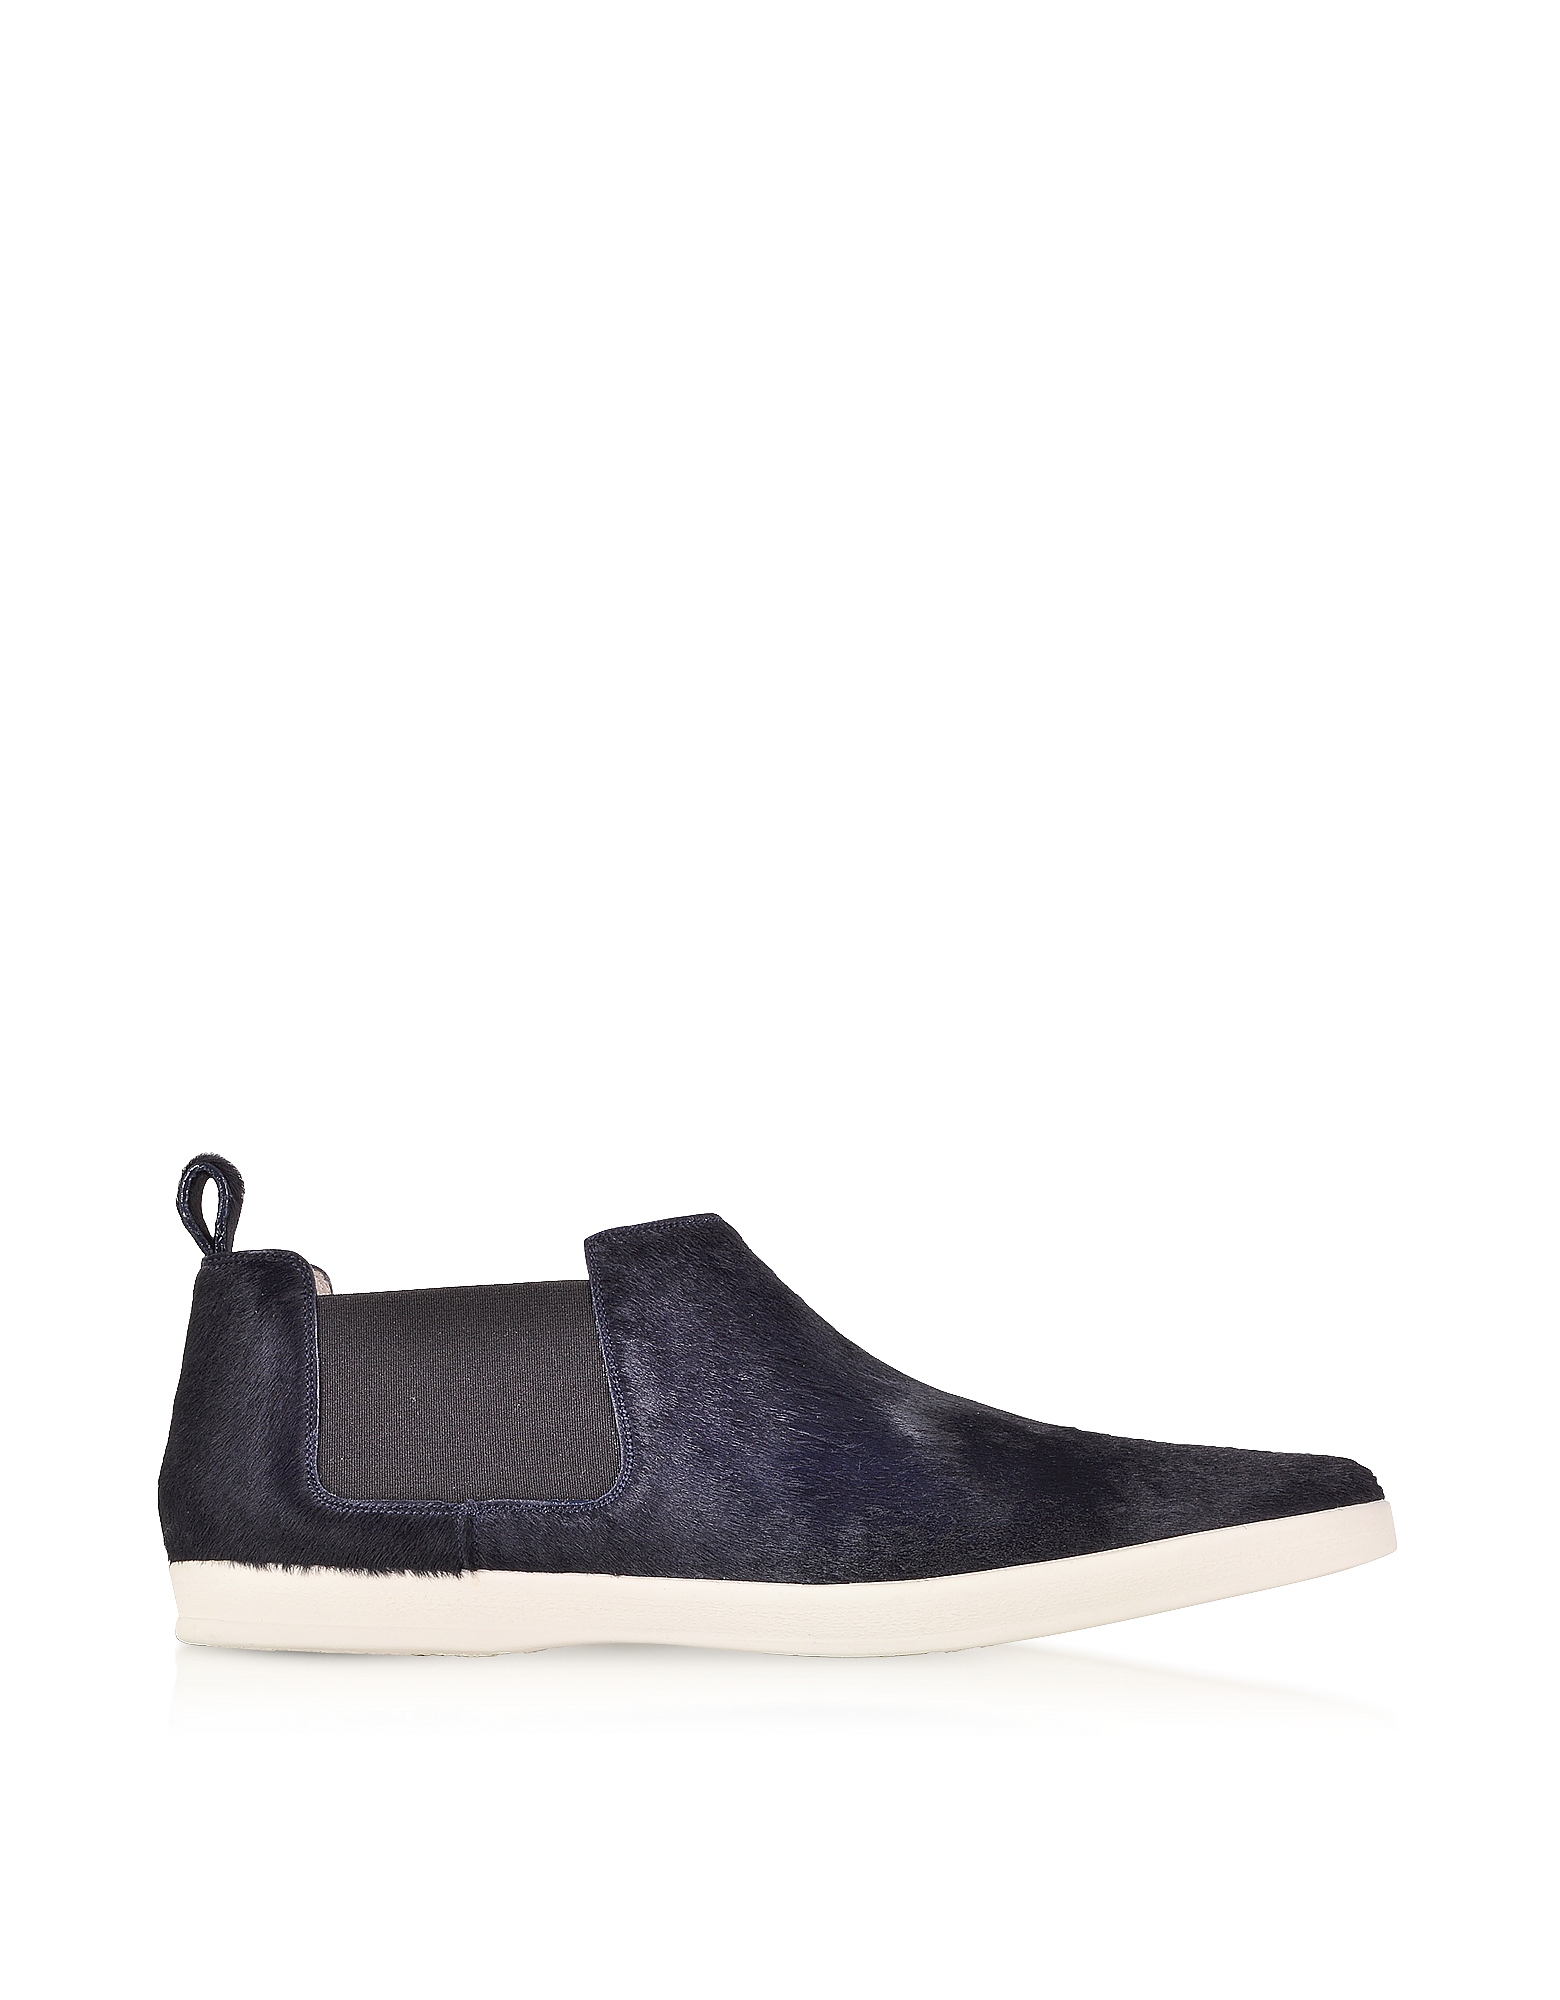 Marc Jacobs Shoes, Luxor Navy Blue Haircalf Sneaker